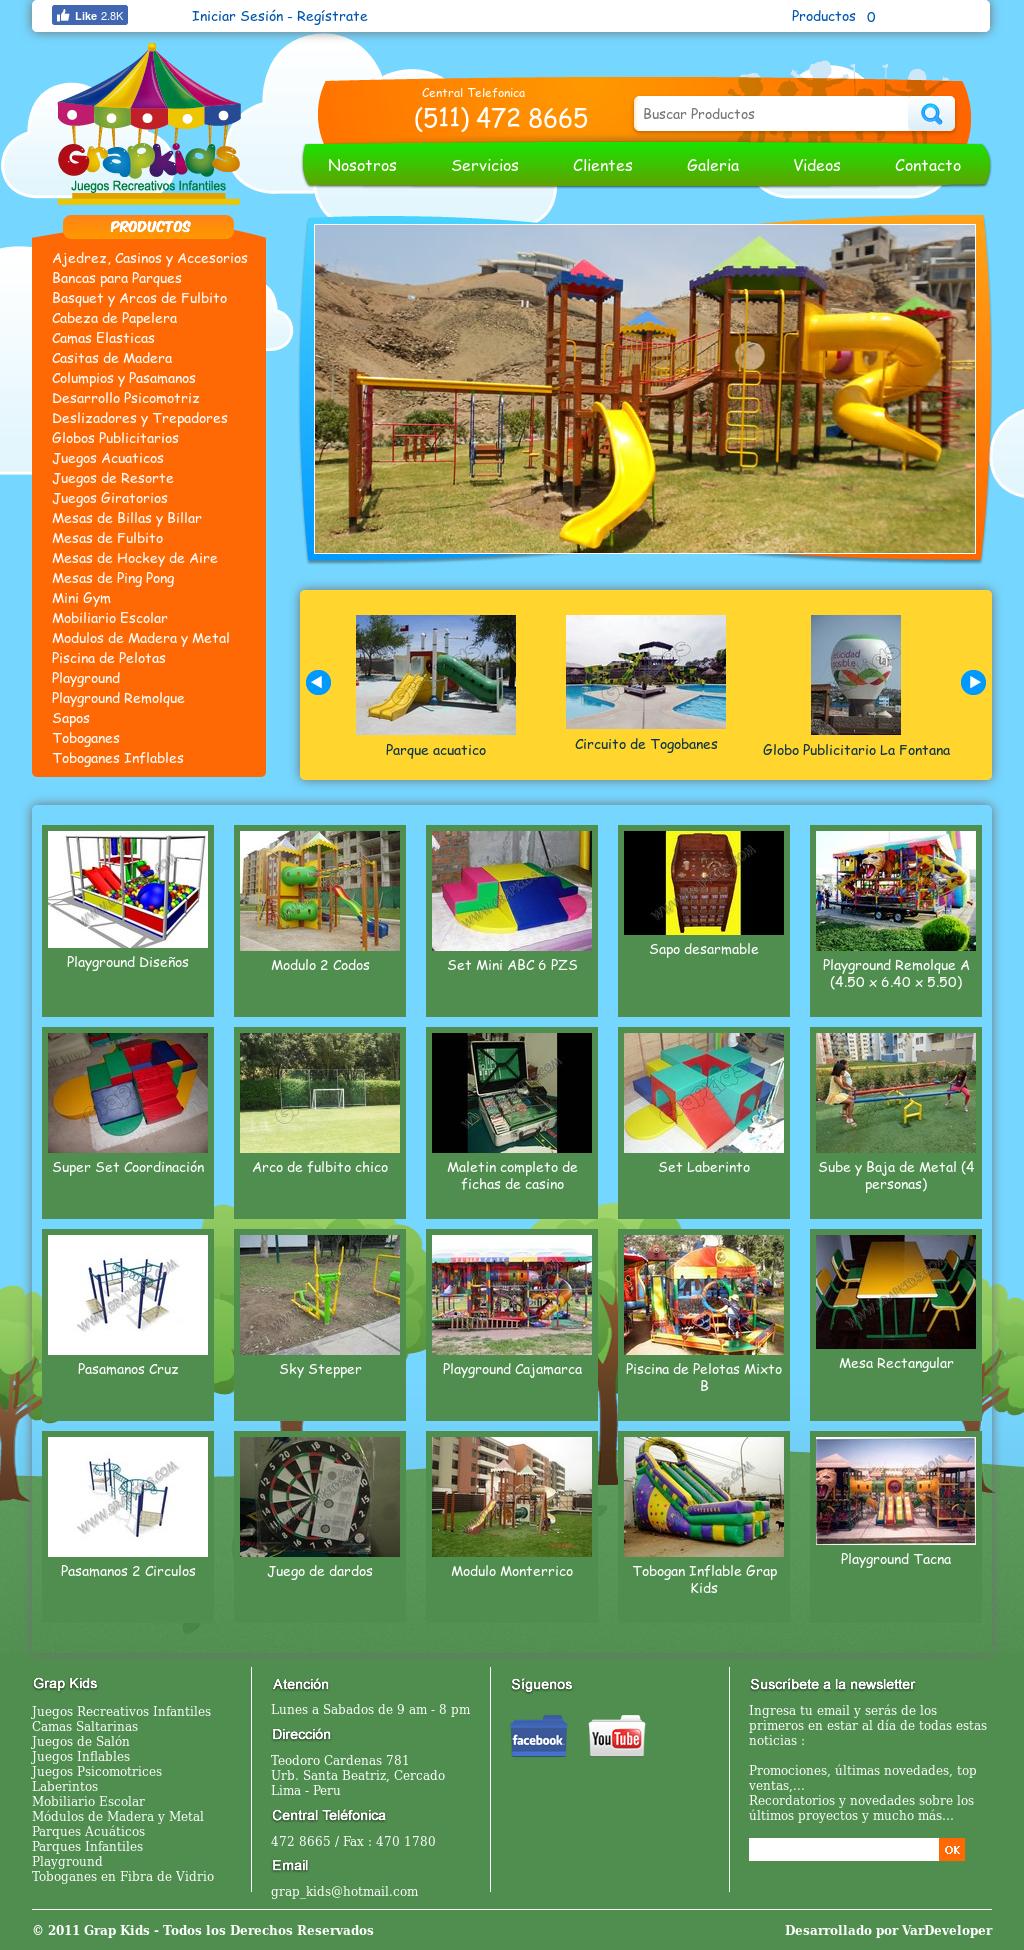 Juegos Recreativos Grap Kids Competitors Revenue And Employees